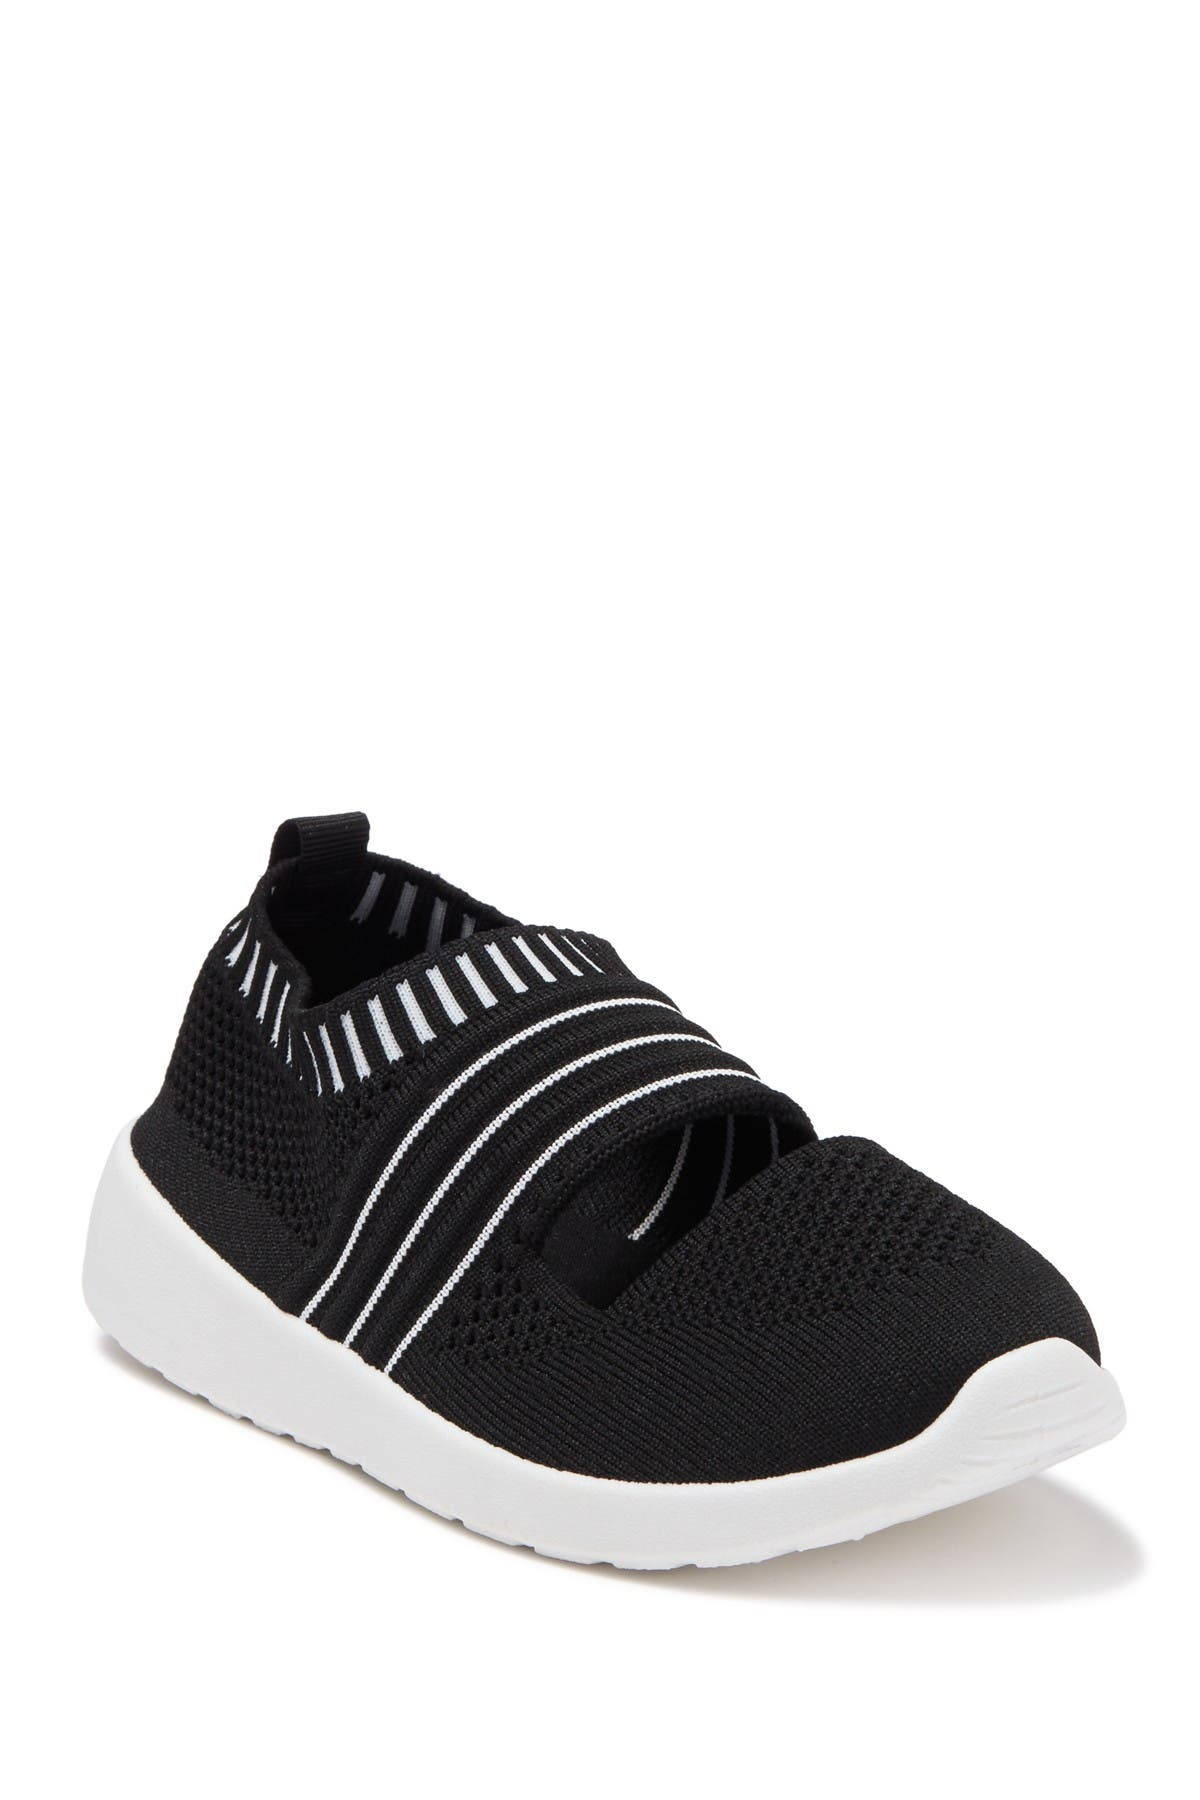 DANSKIN | Empower Mary Jane Sneaker